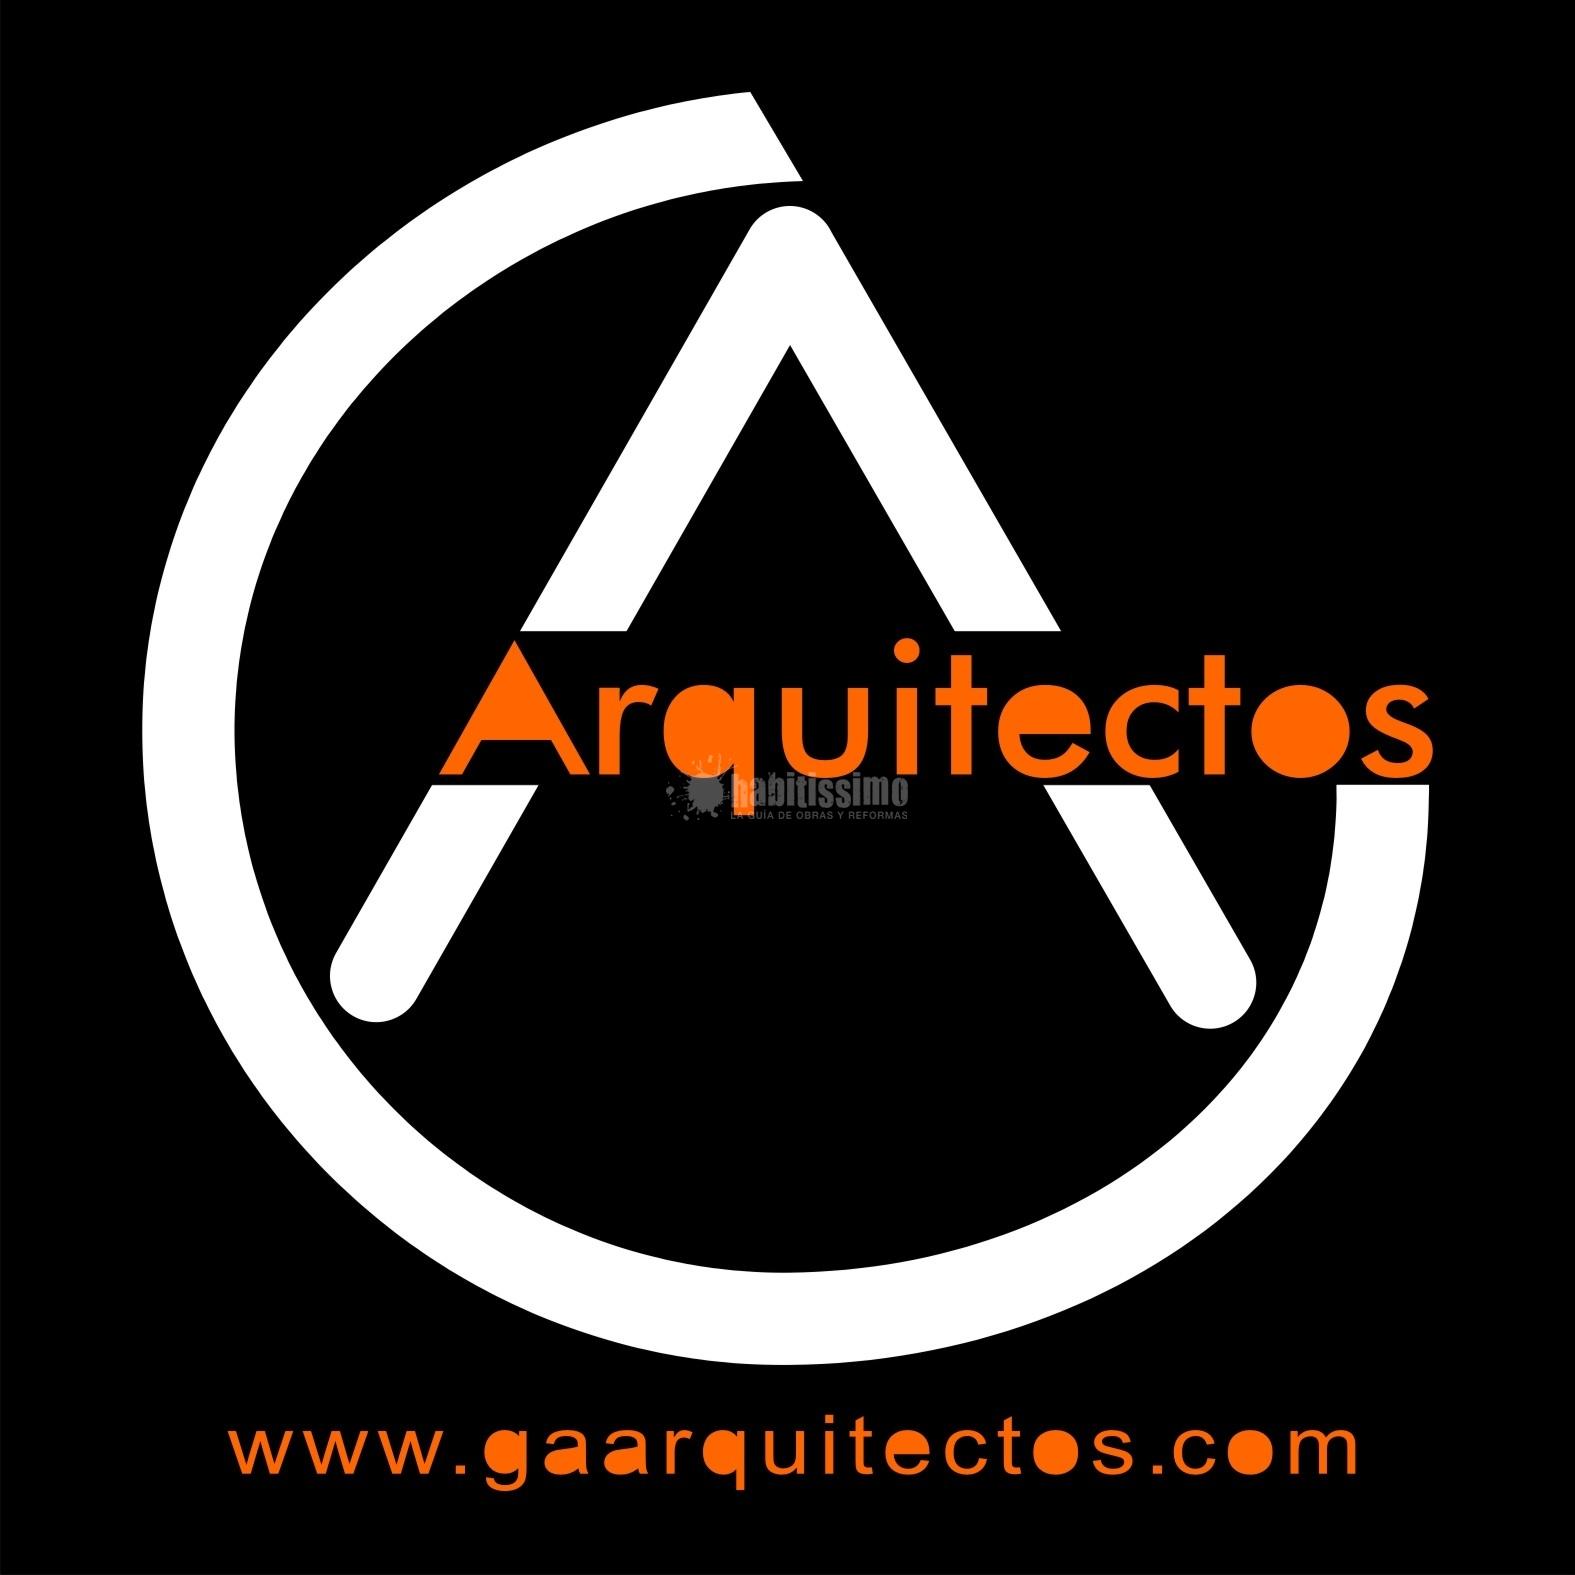 GA arquitectos